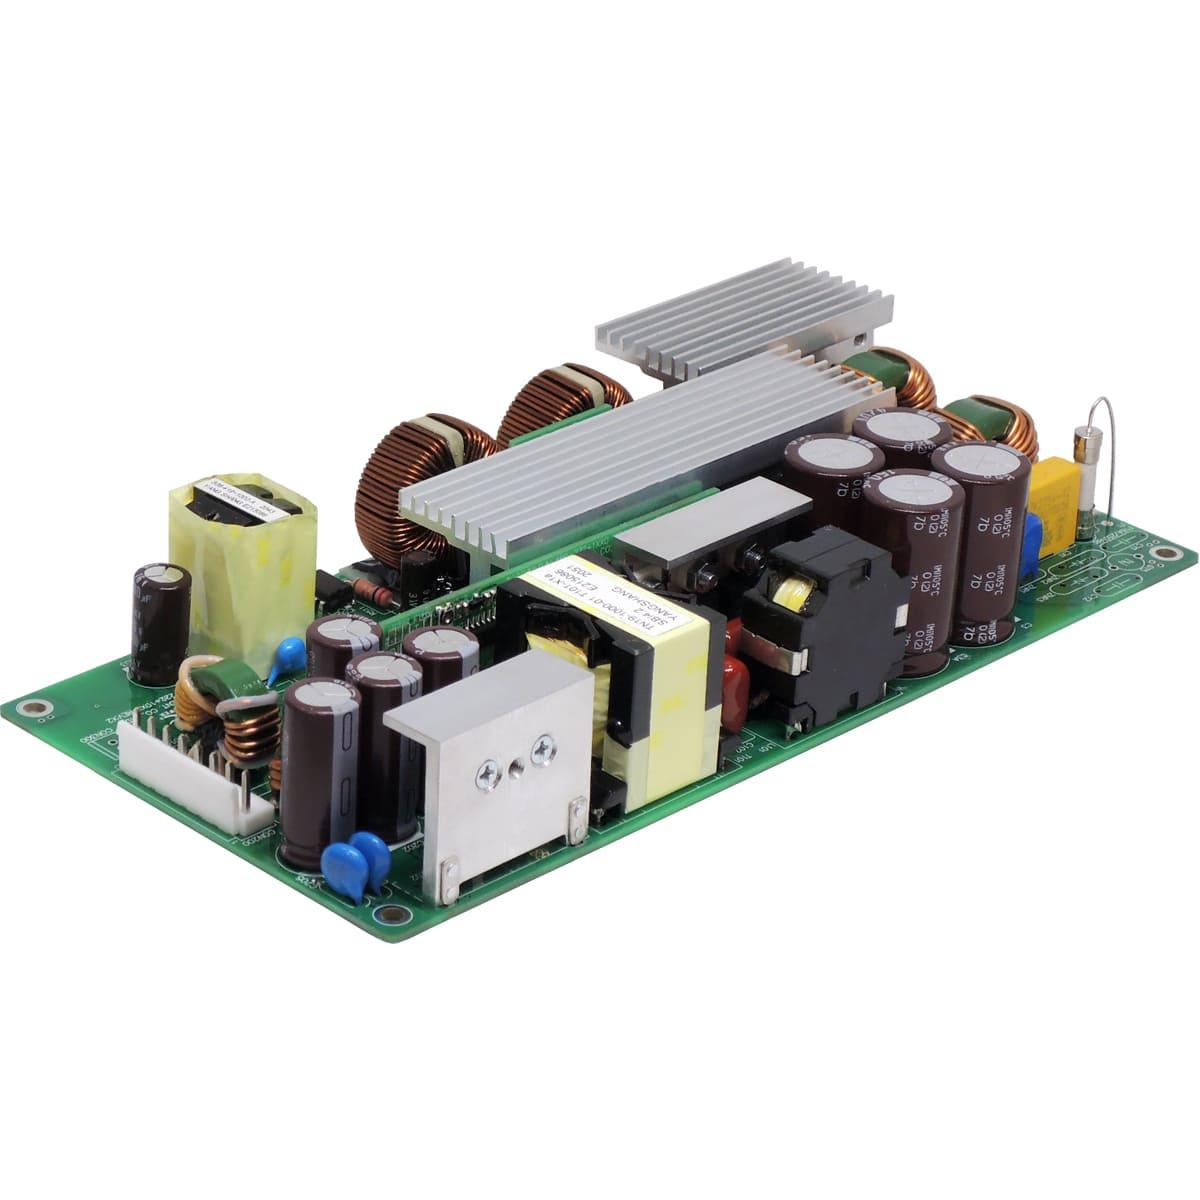 TN19-1000-01 Power over internet supply